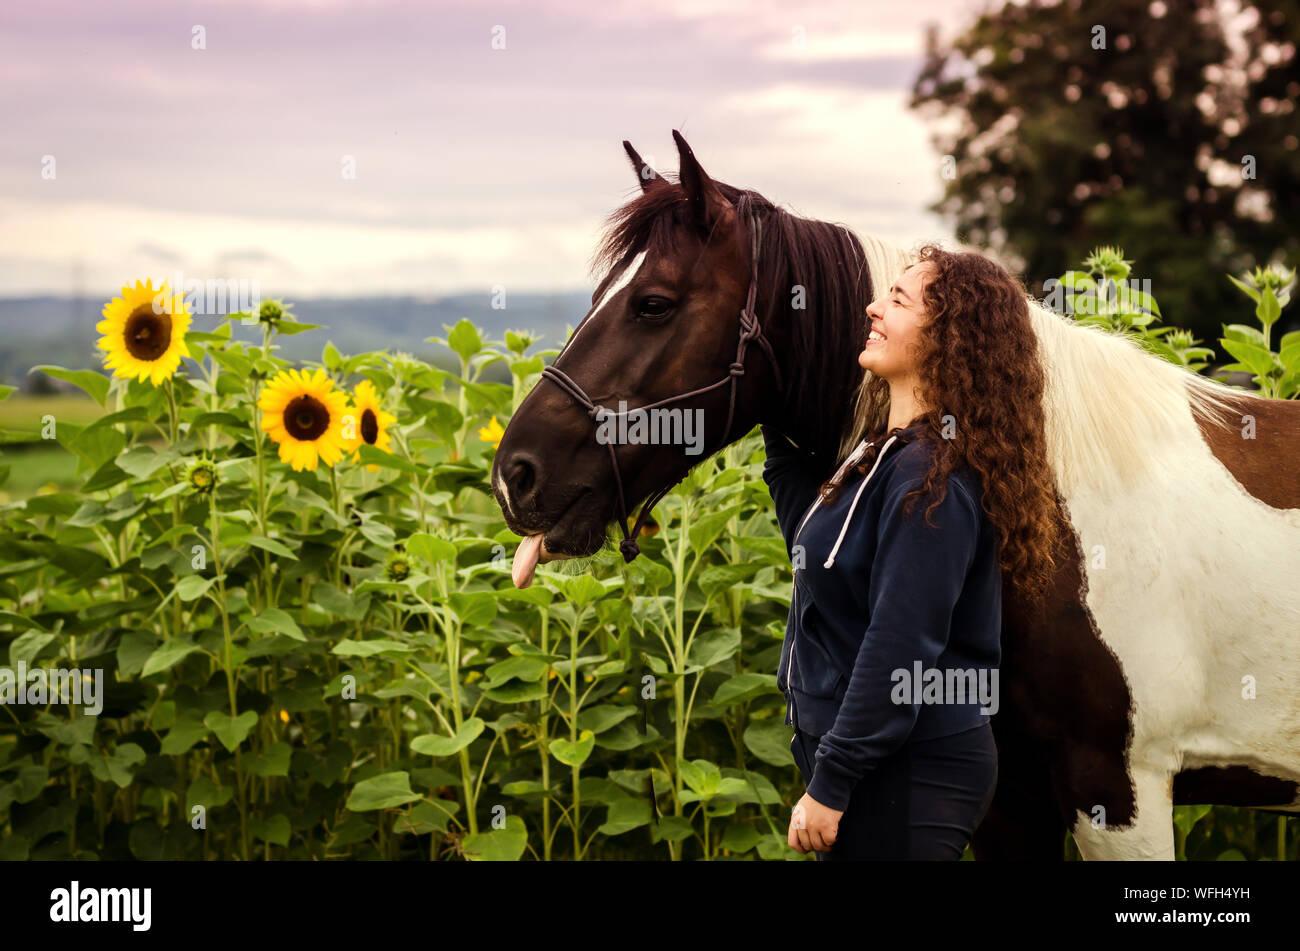 Vista lateral de la Mujer de pie a caballo en campo de girasol Foto de stock